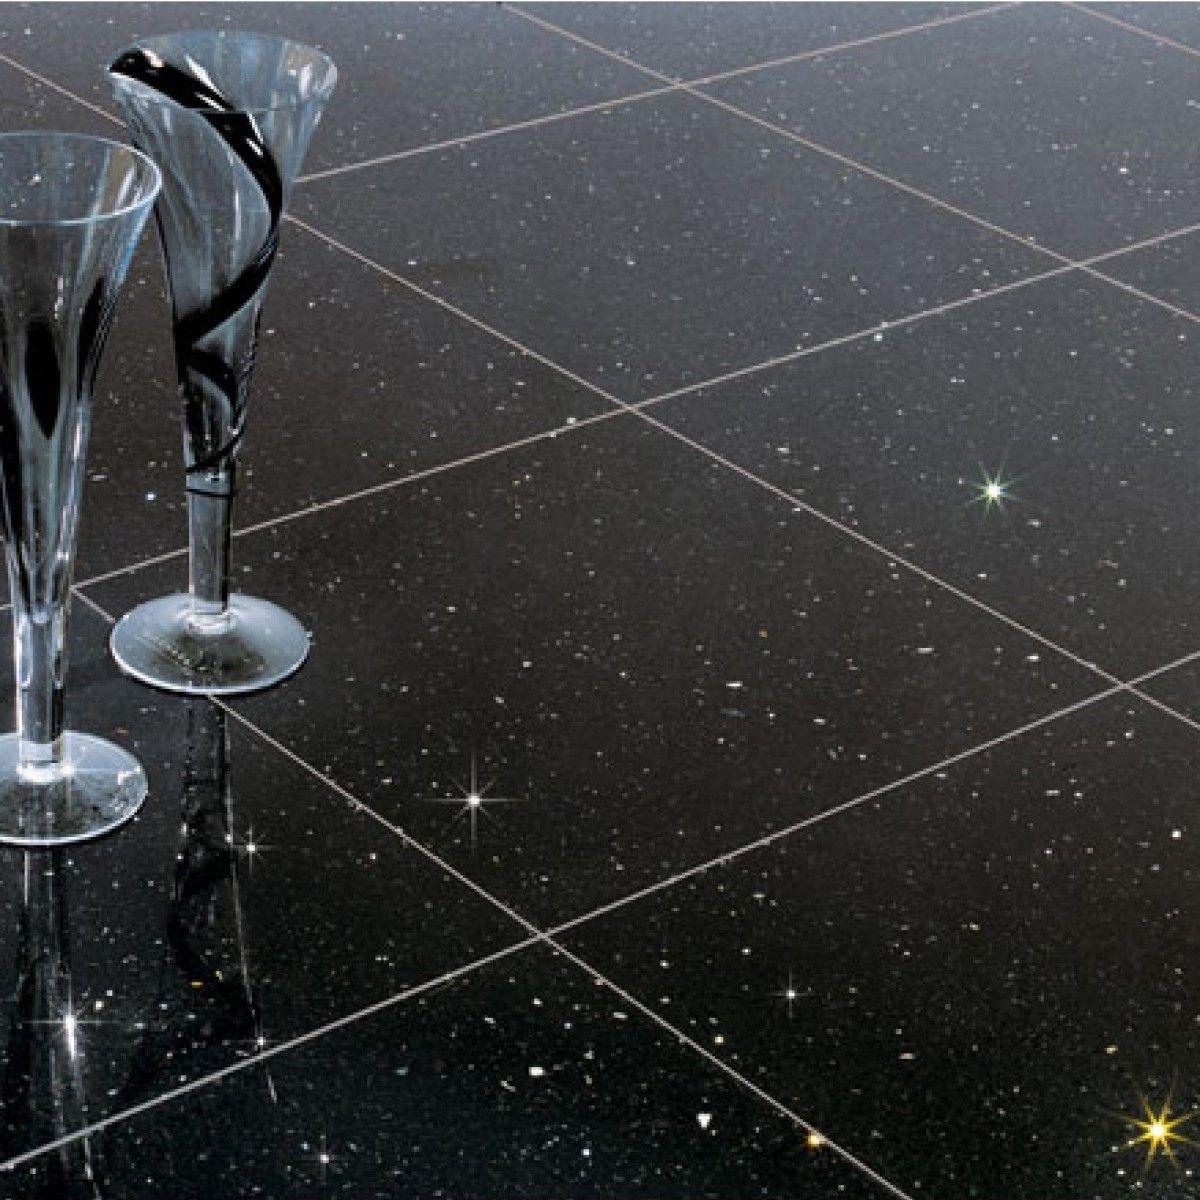 Crown Tiles 30x30cm Quartz Star Stone Black Wall And Floor Tiles